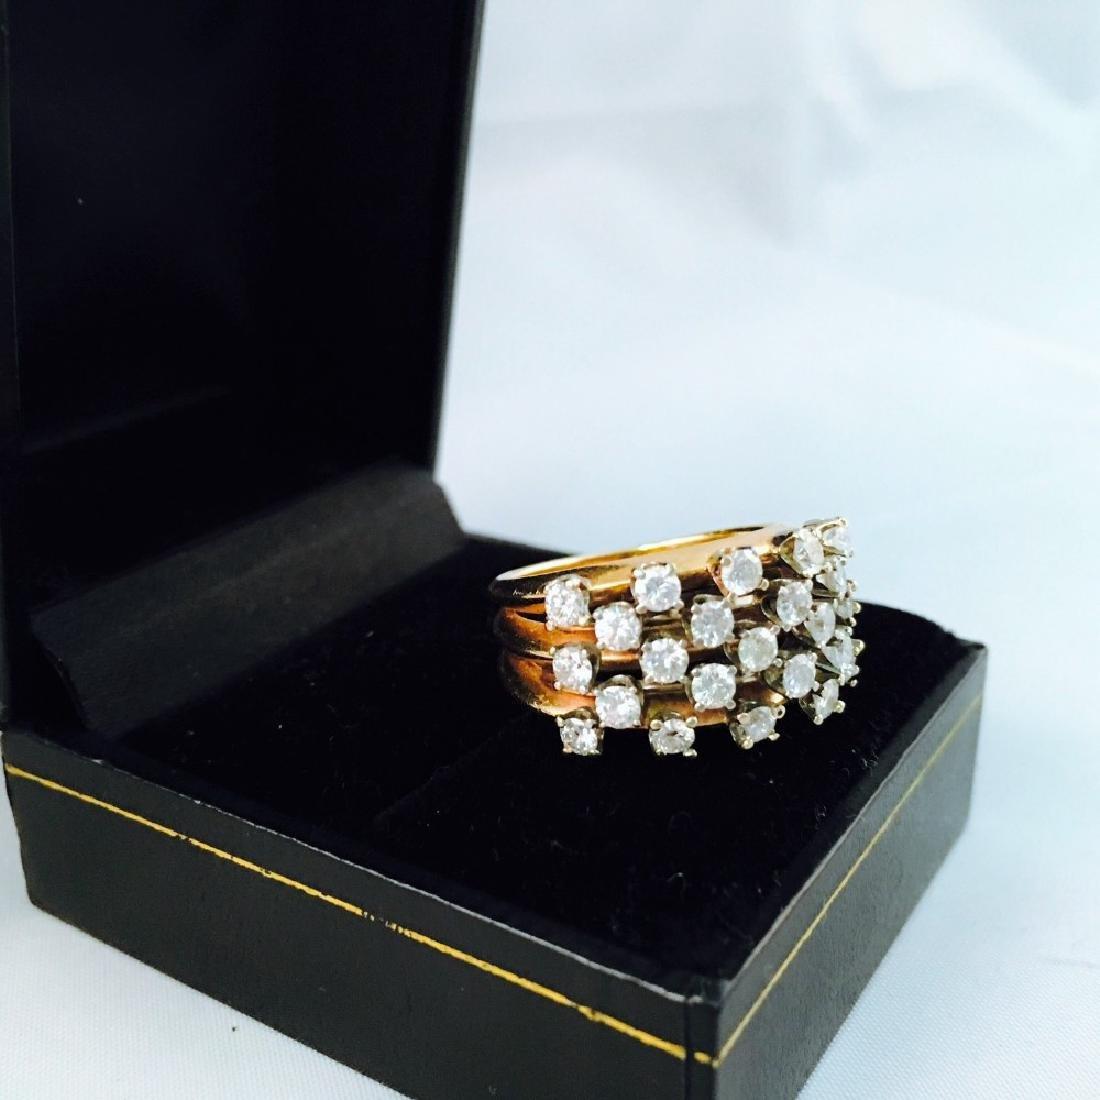 14k Gold, White Diamond Cocktail Ring - 4